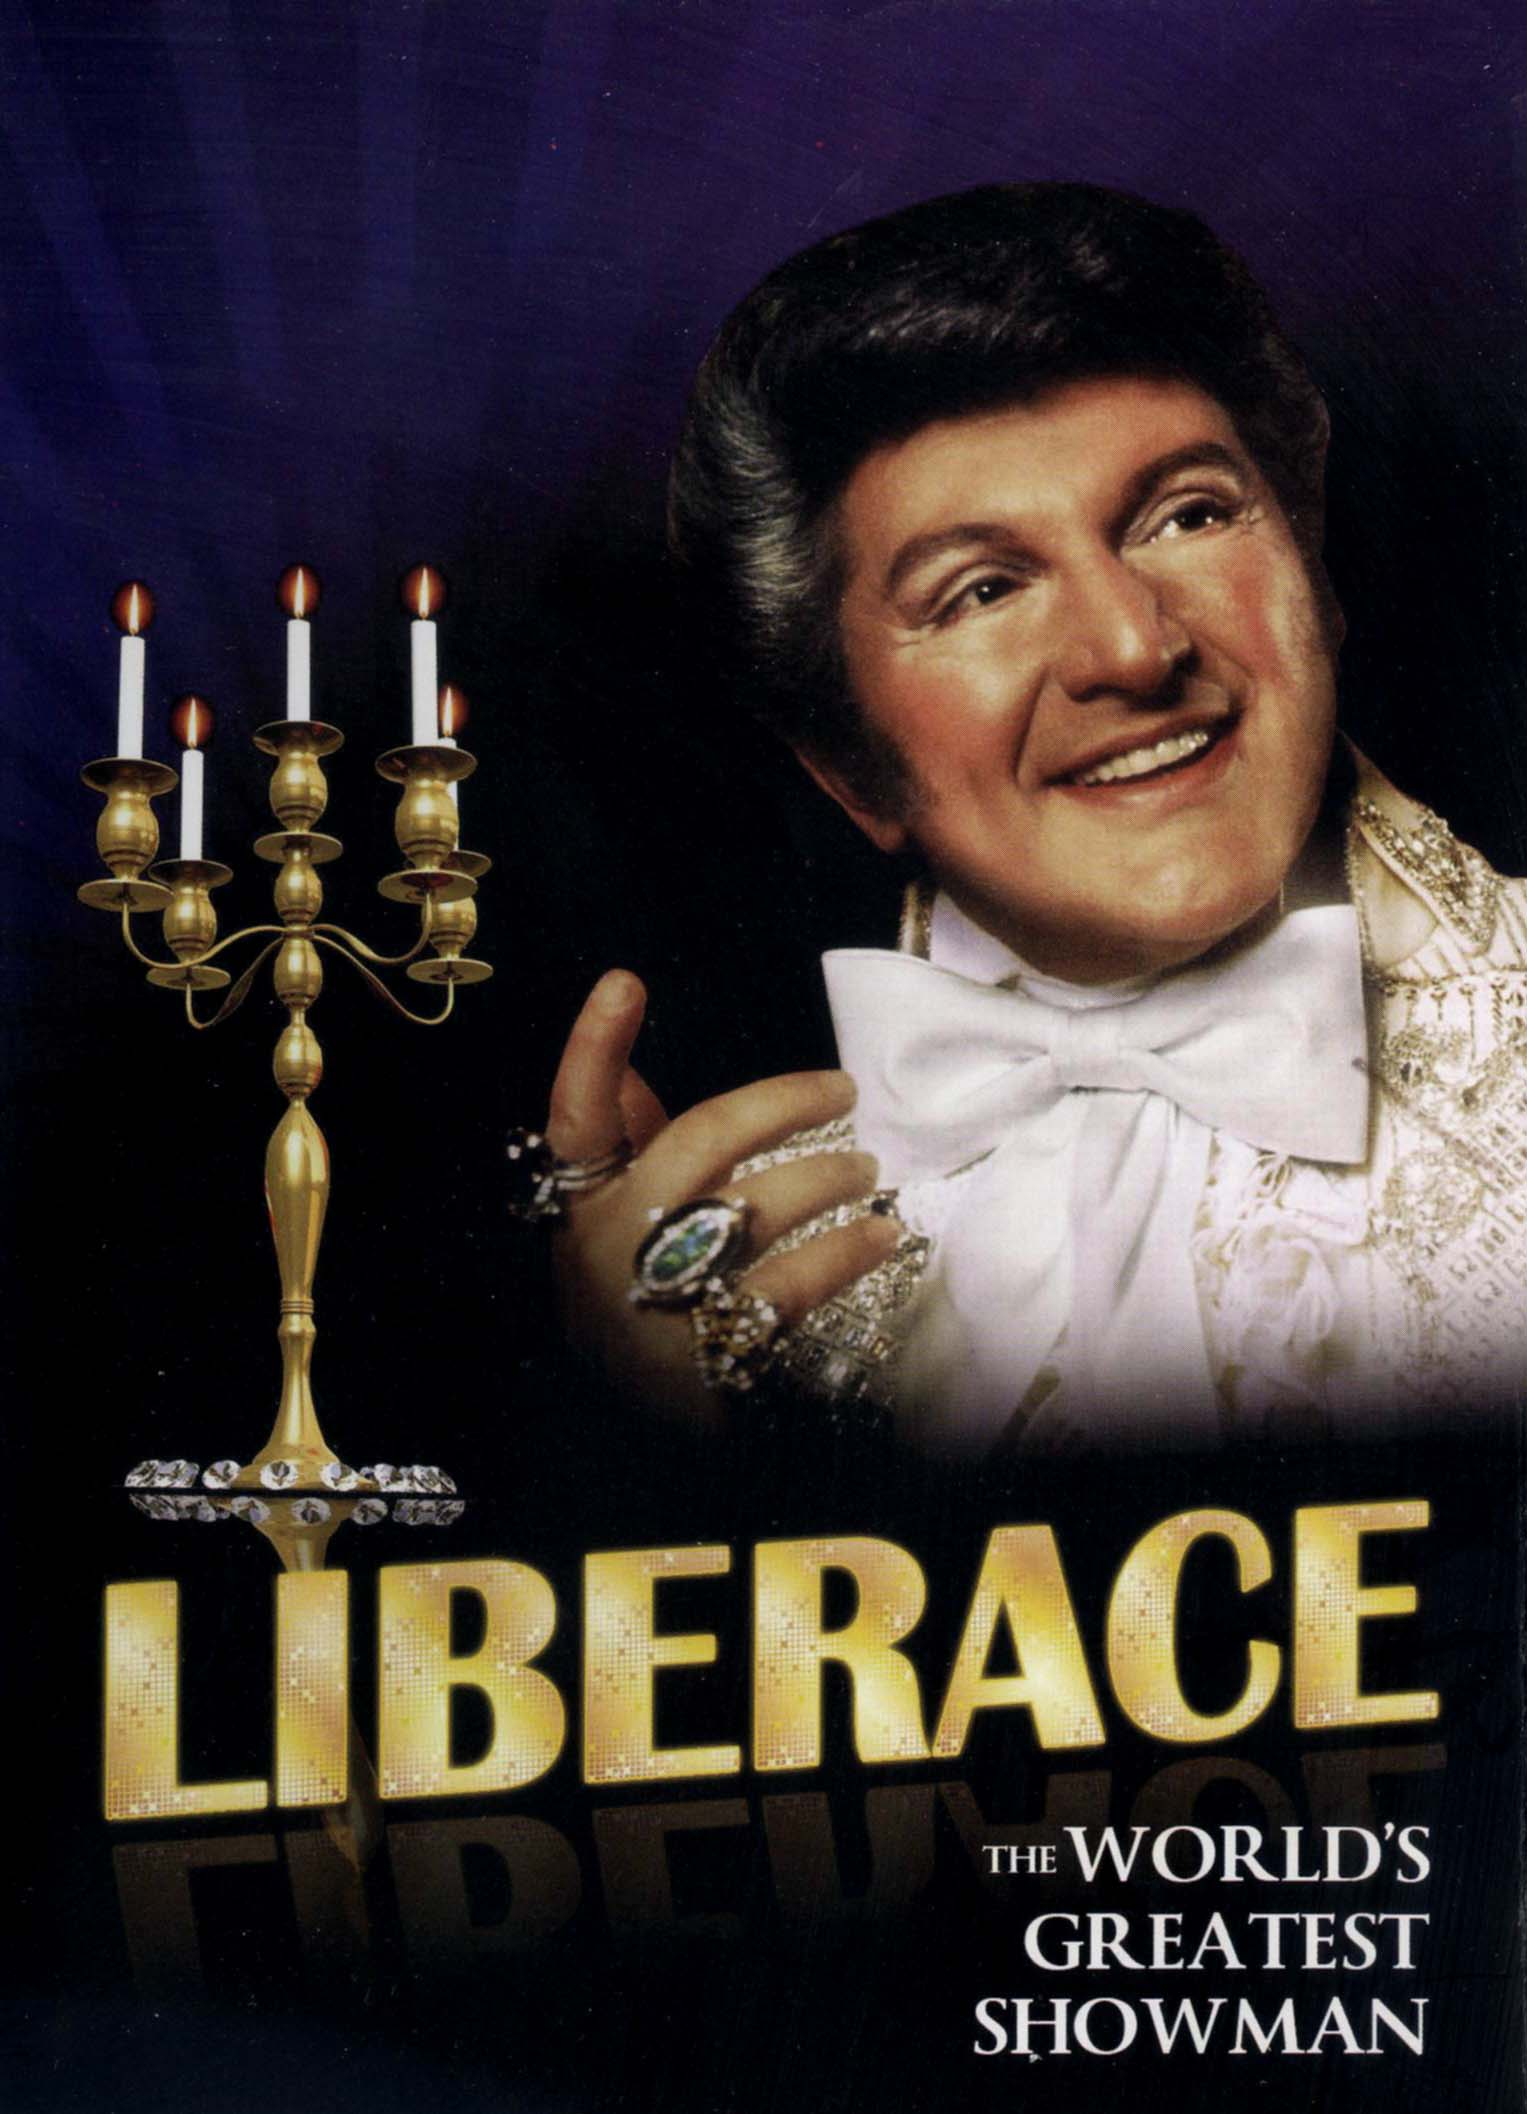 Liberace: The World's Greatest Showman